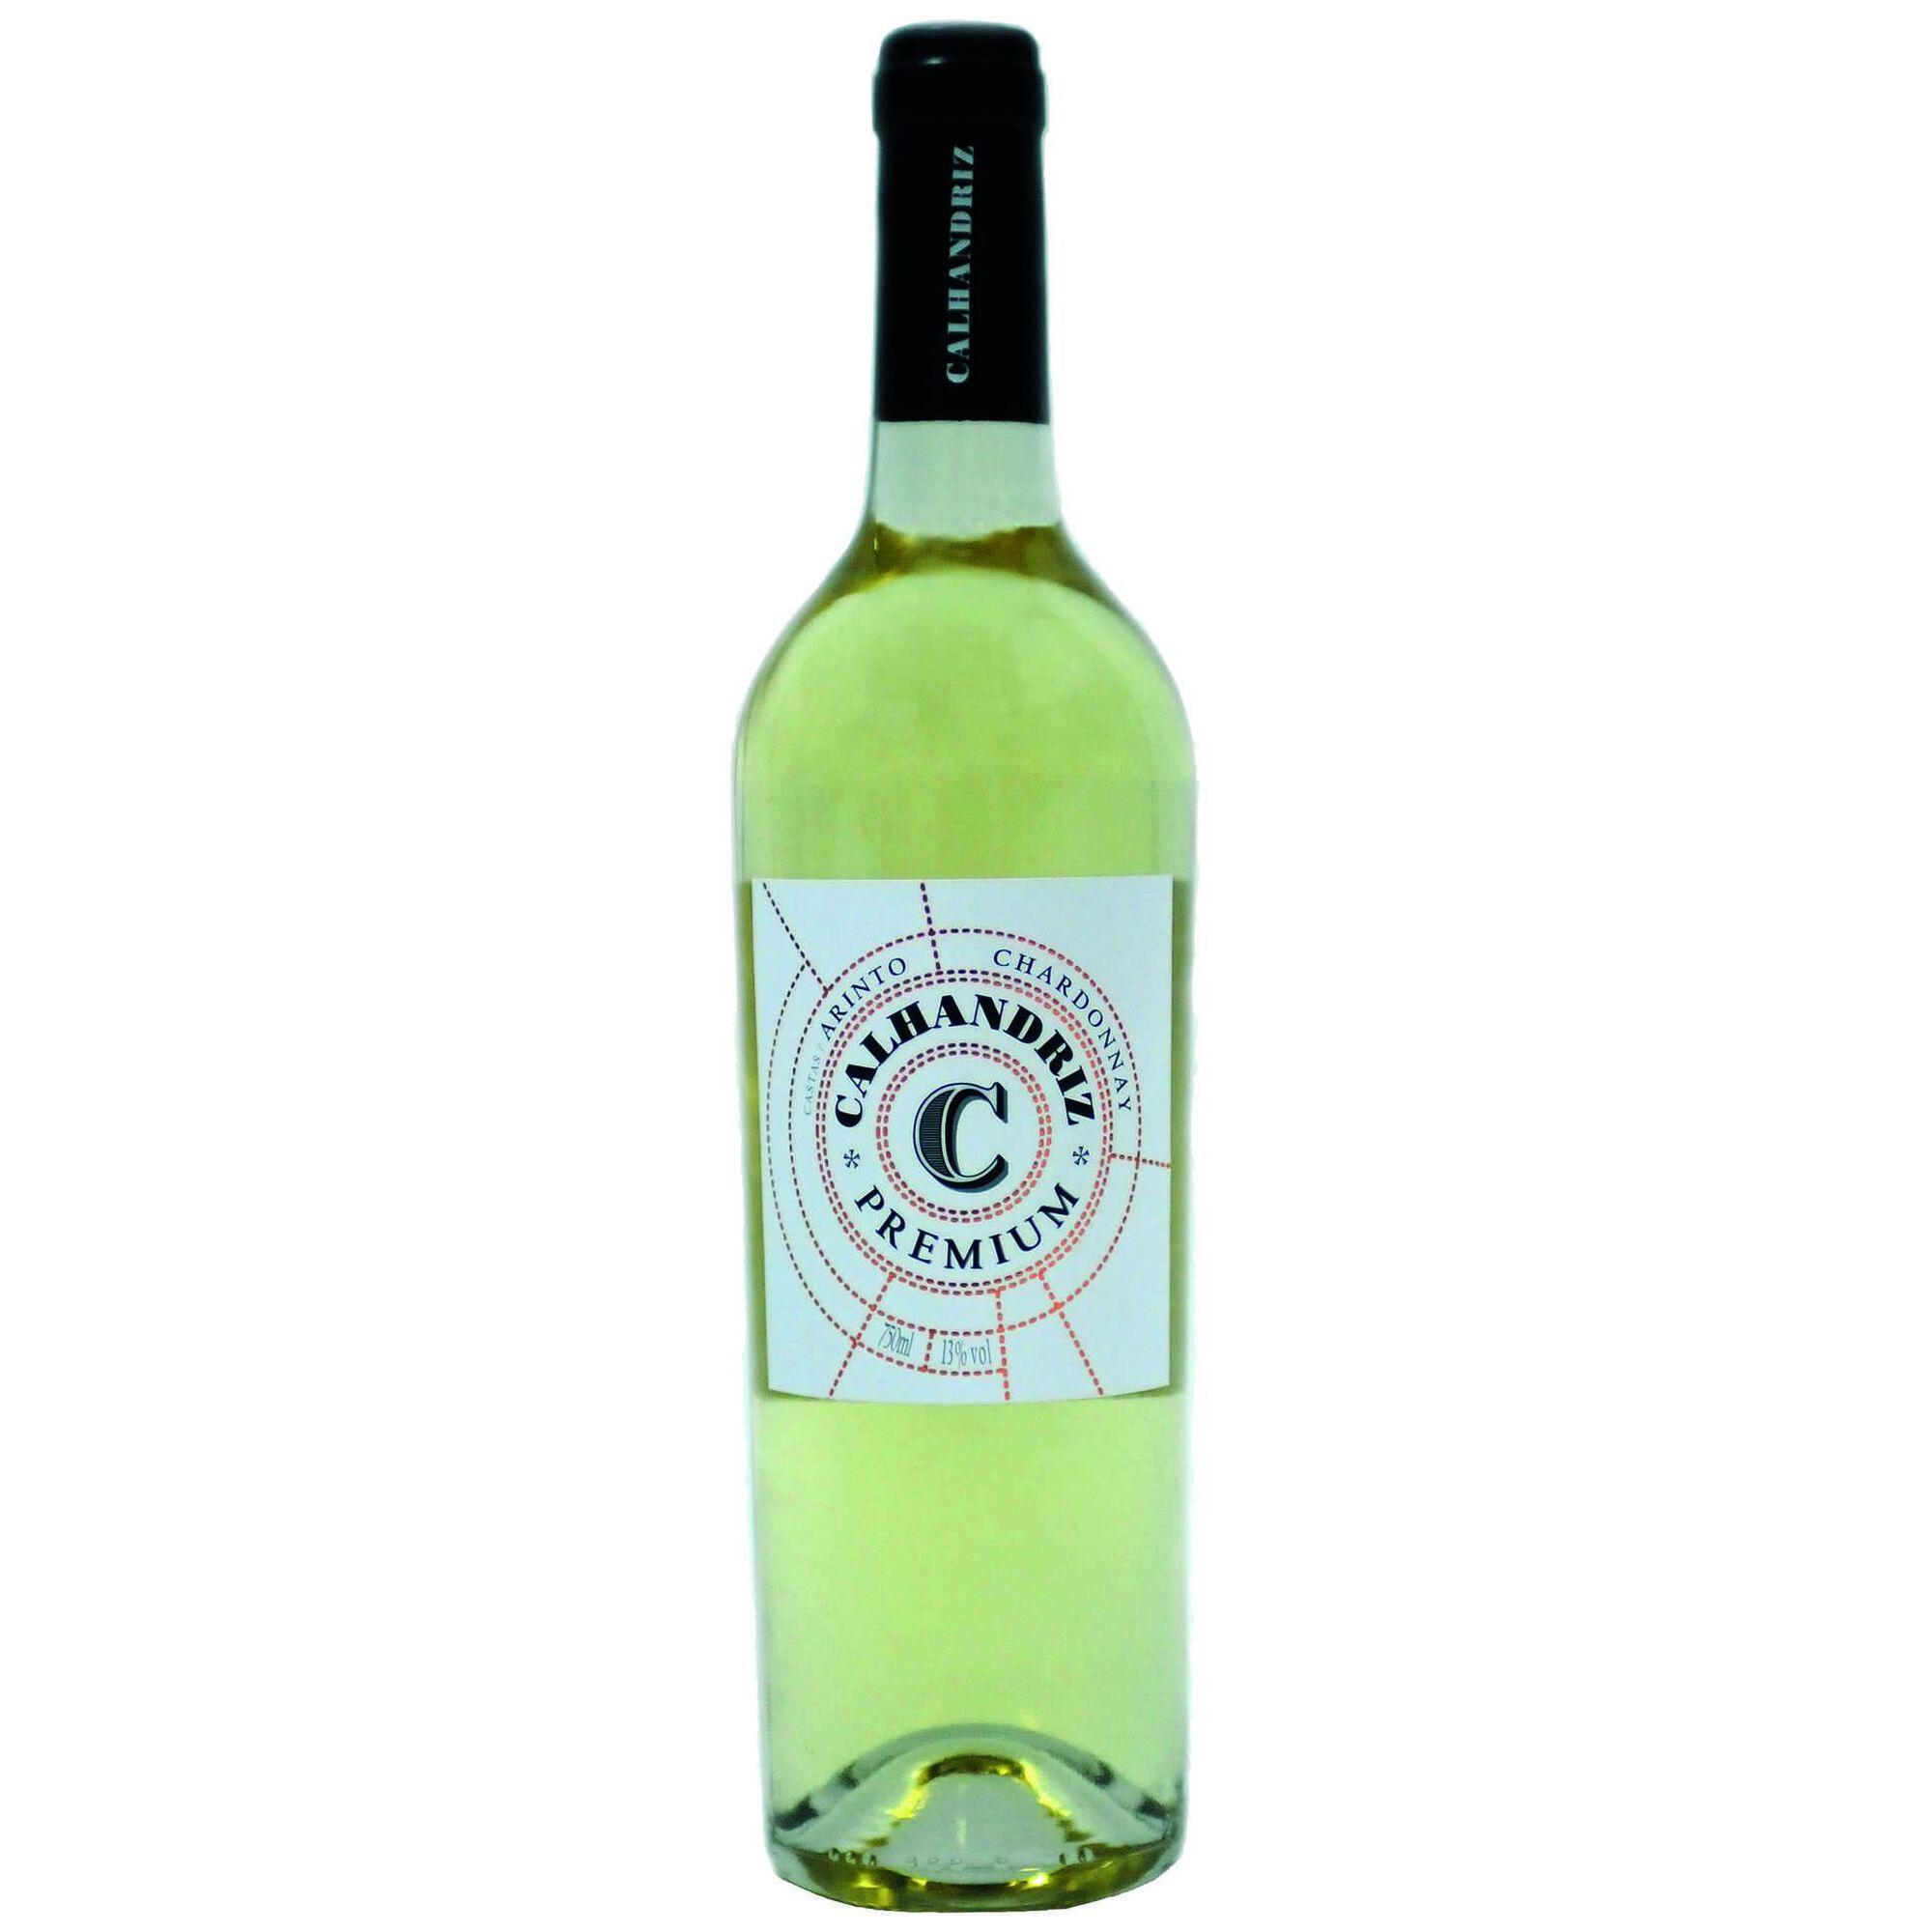 Calhandriz Premium Regional Lisboa Vinho Branco